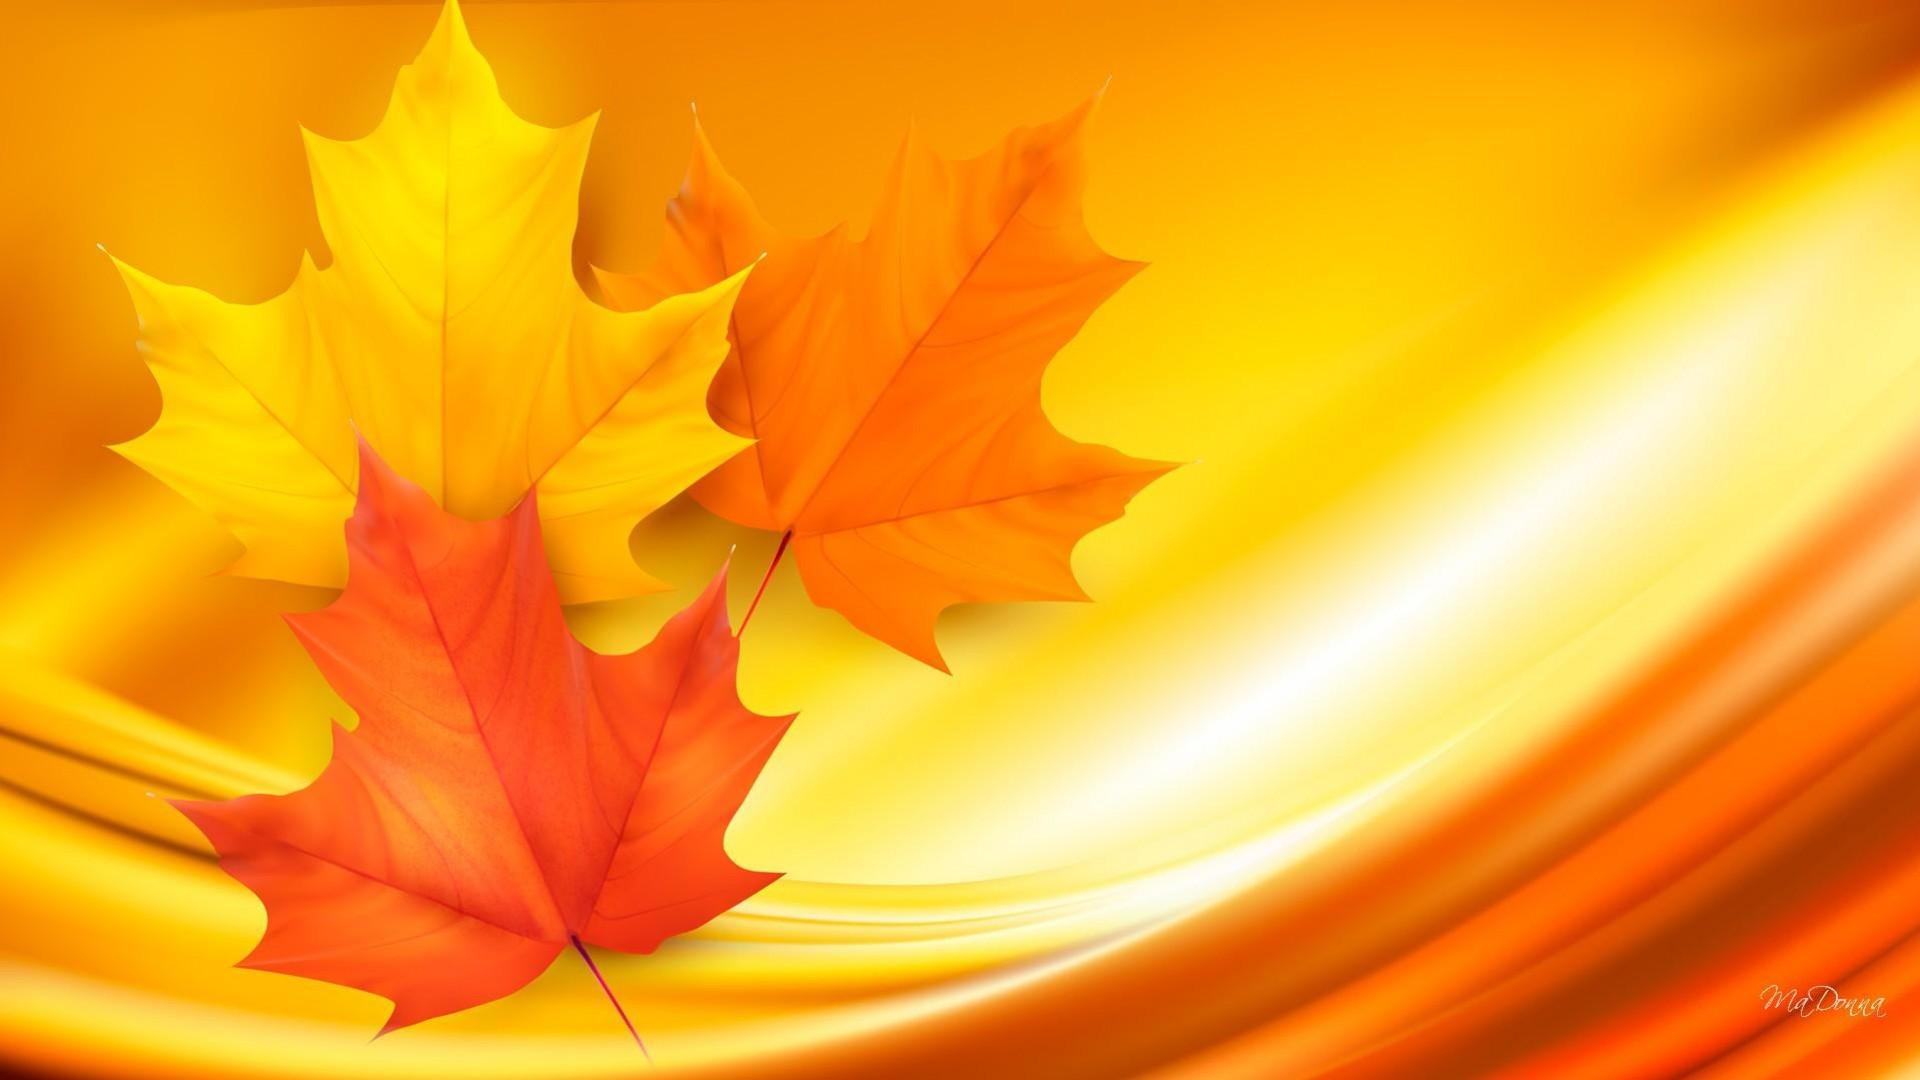 Fall Full HD Wallpaper